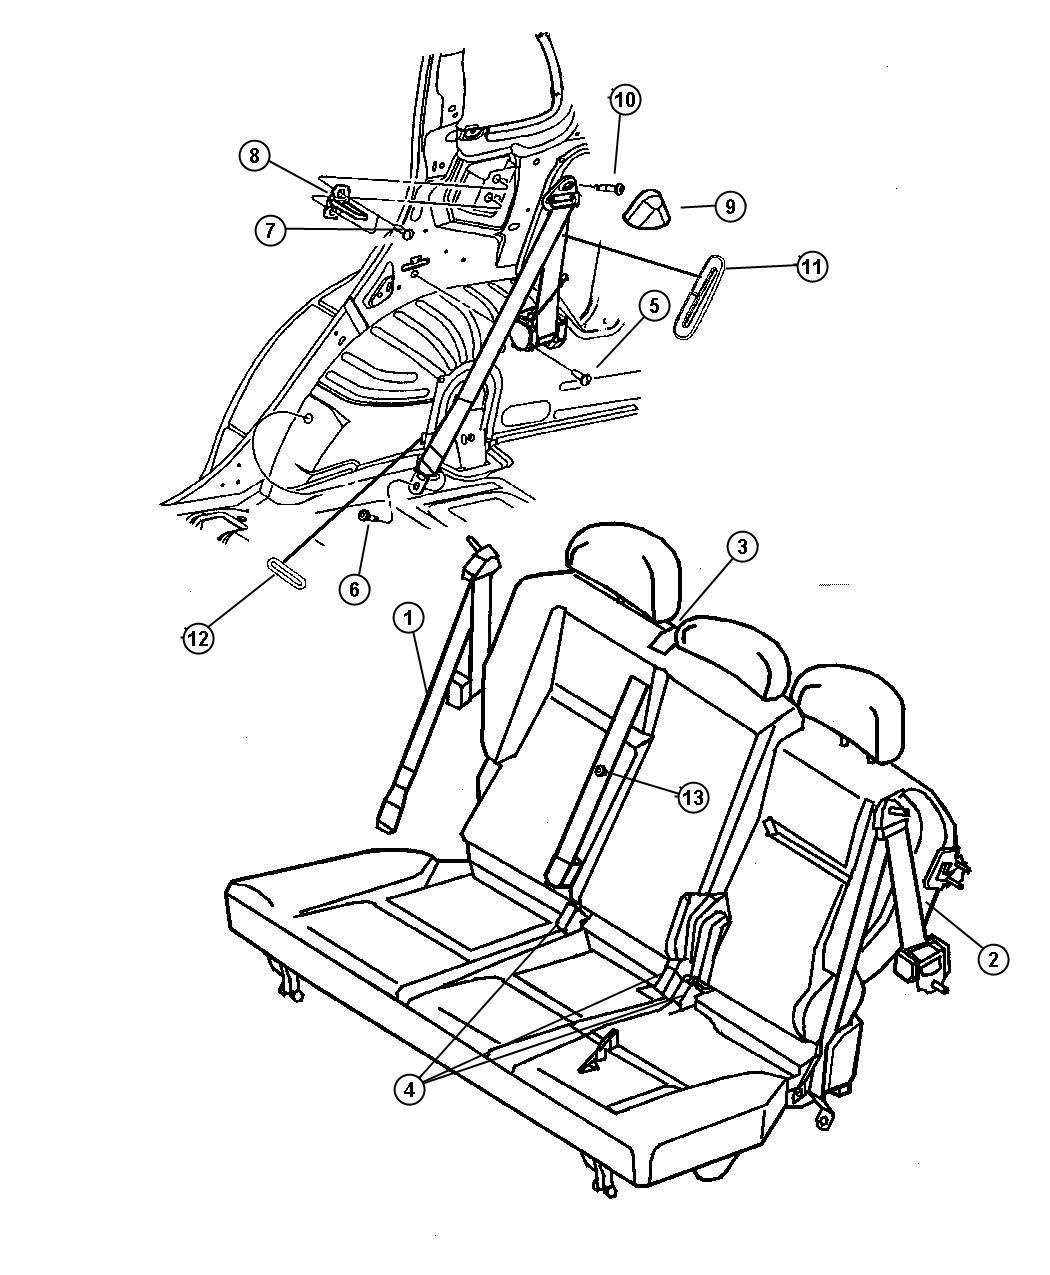 2012 dodge journey seat belt  outboard  buckle half w